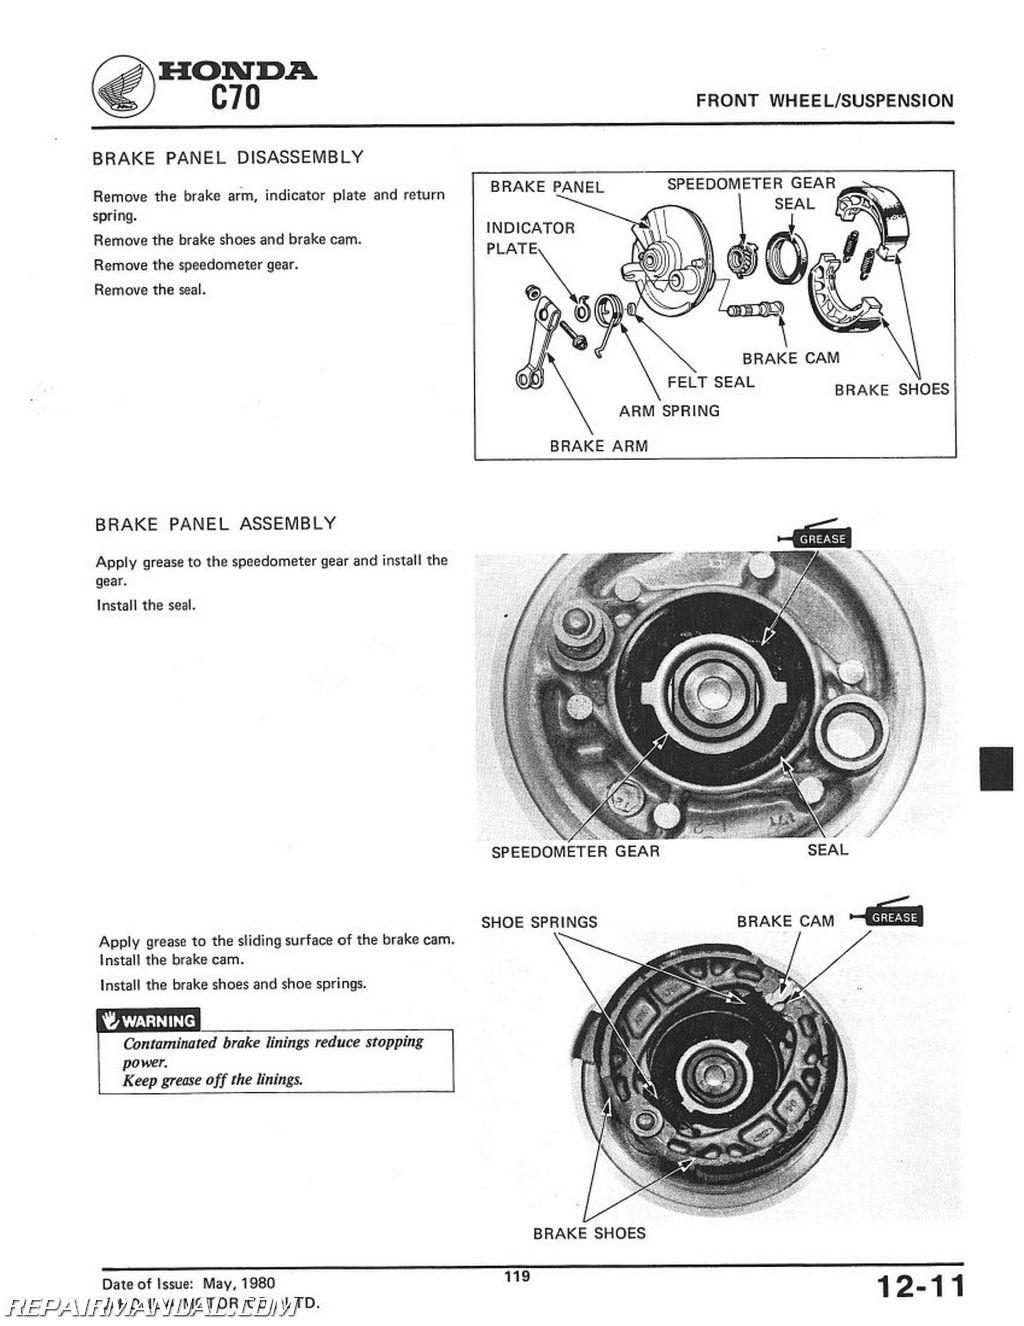 1980 1982 honda c70 scooter workshop service repair manual rh repairmanual com honda c70 parts diagram honda c70 passport parts diagram